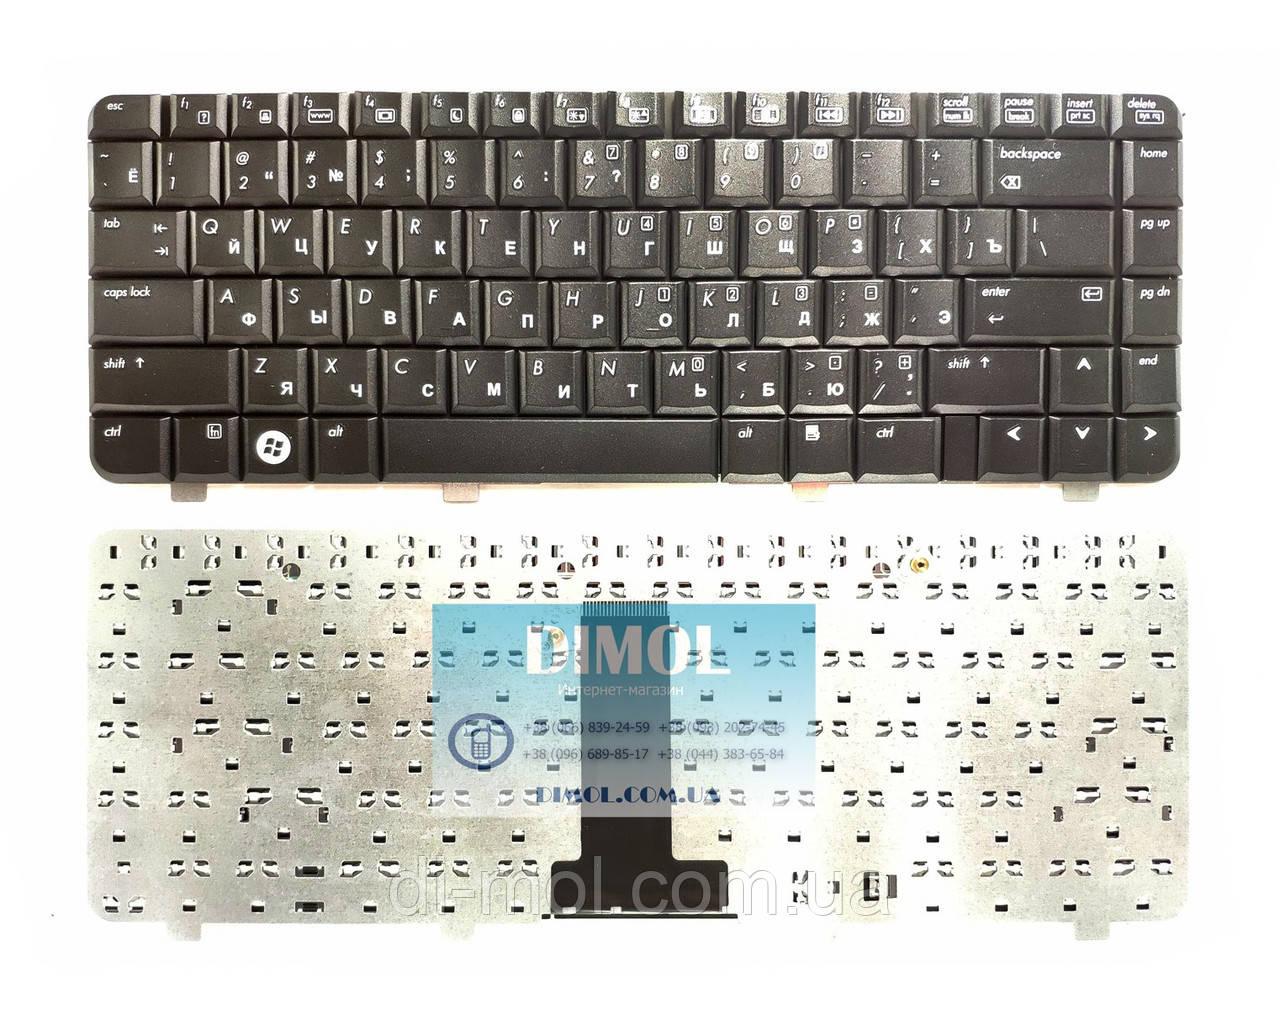 Оригинальная клавиатура для HP Compaq 510, 530 series, black, ru